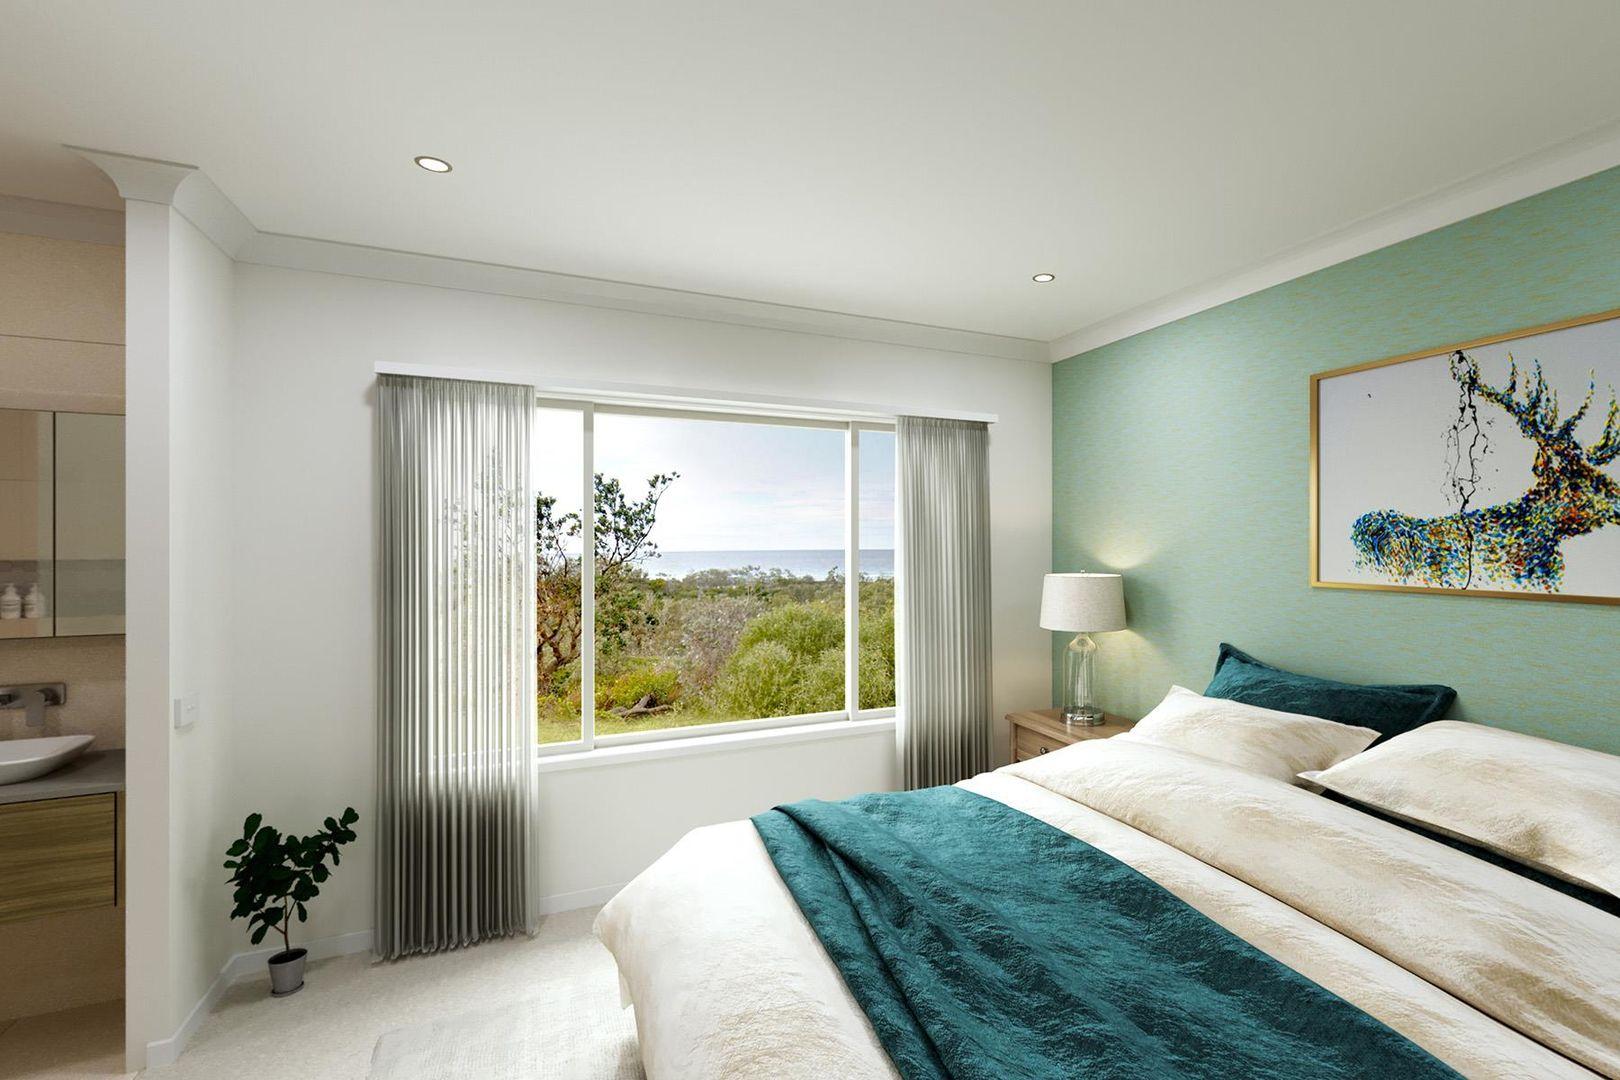 Lot 31 Harness Rd, Pinnacle Views, Kelso QLD 4815, Image 2